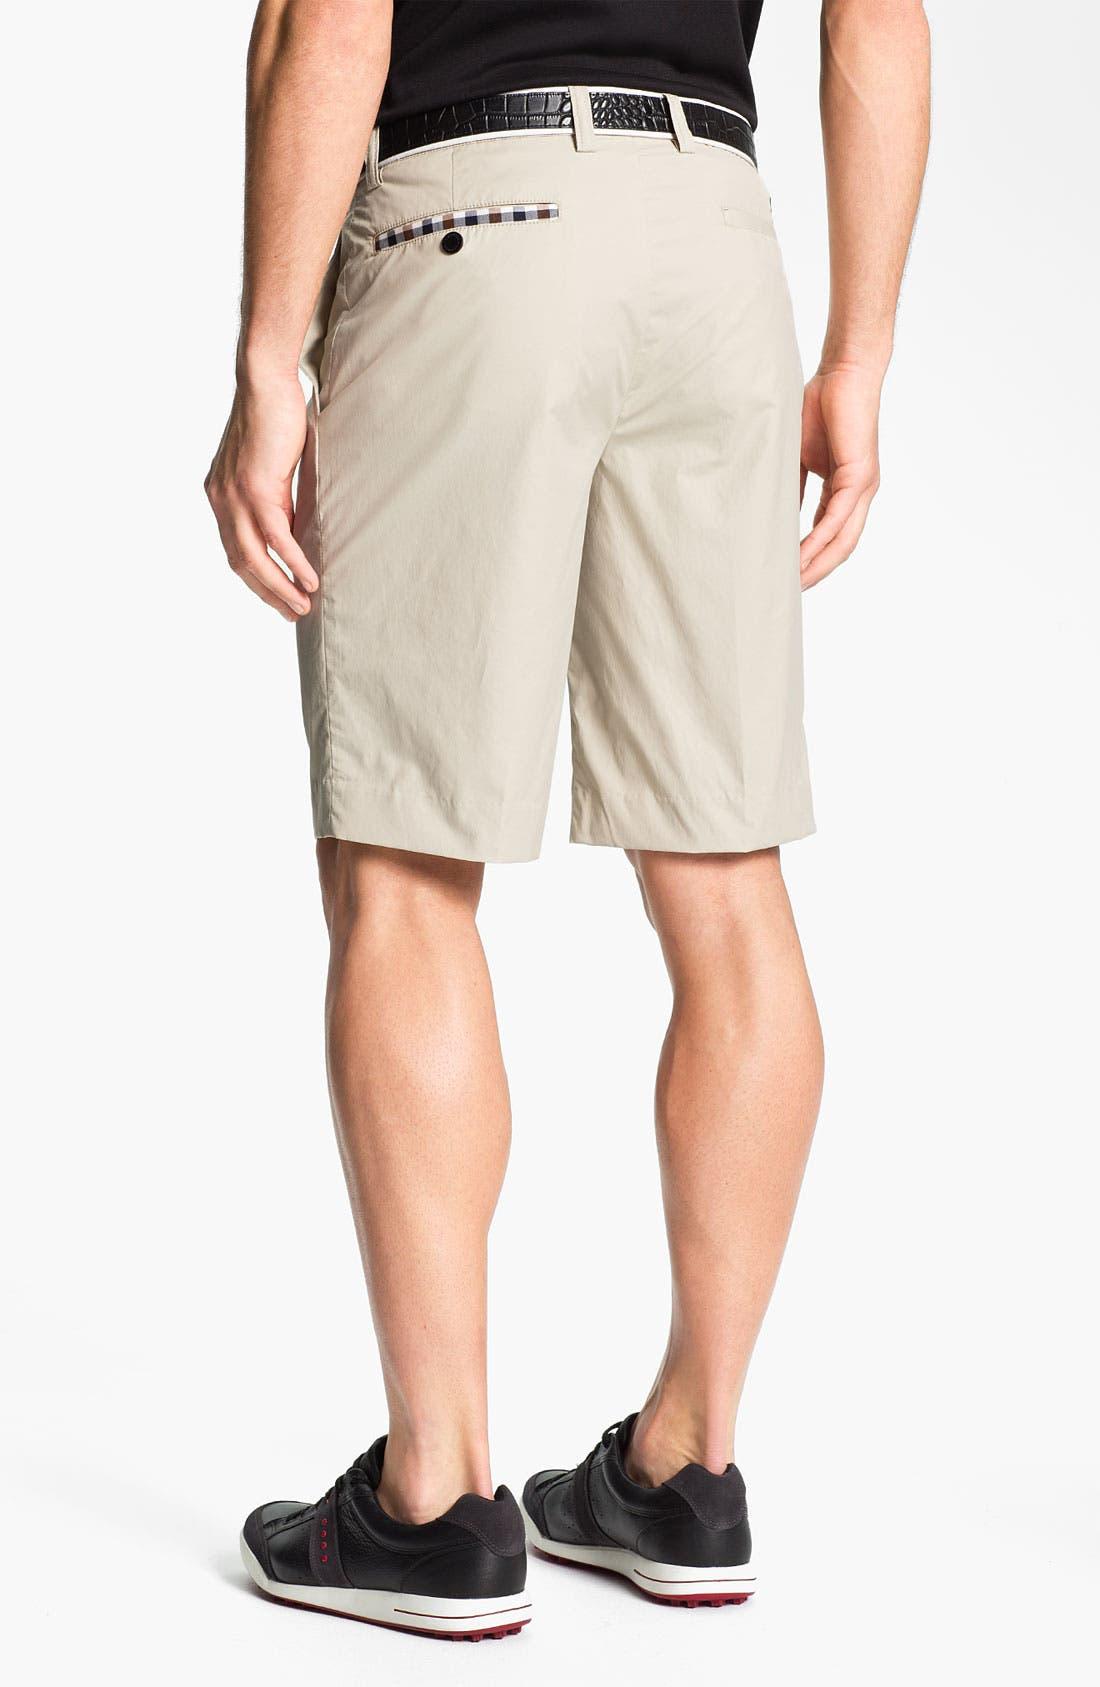 Alternate Image 2  - Aquascutum Golf 'Mash' Golf Shorts (Online Only)